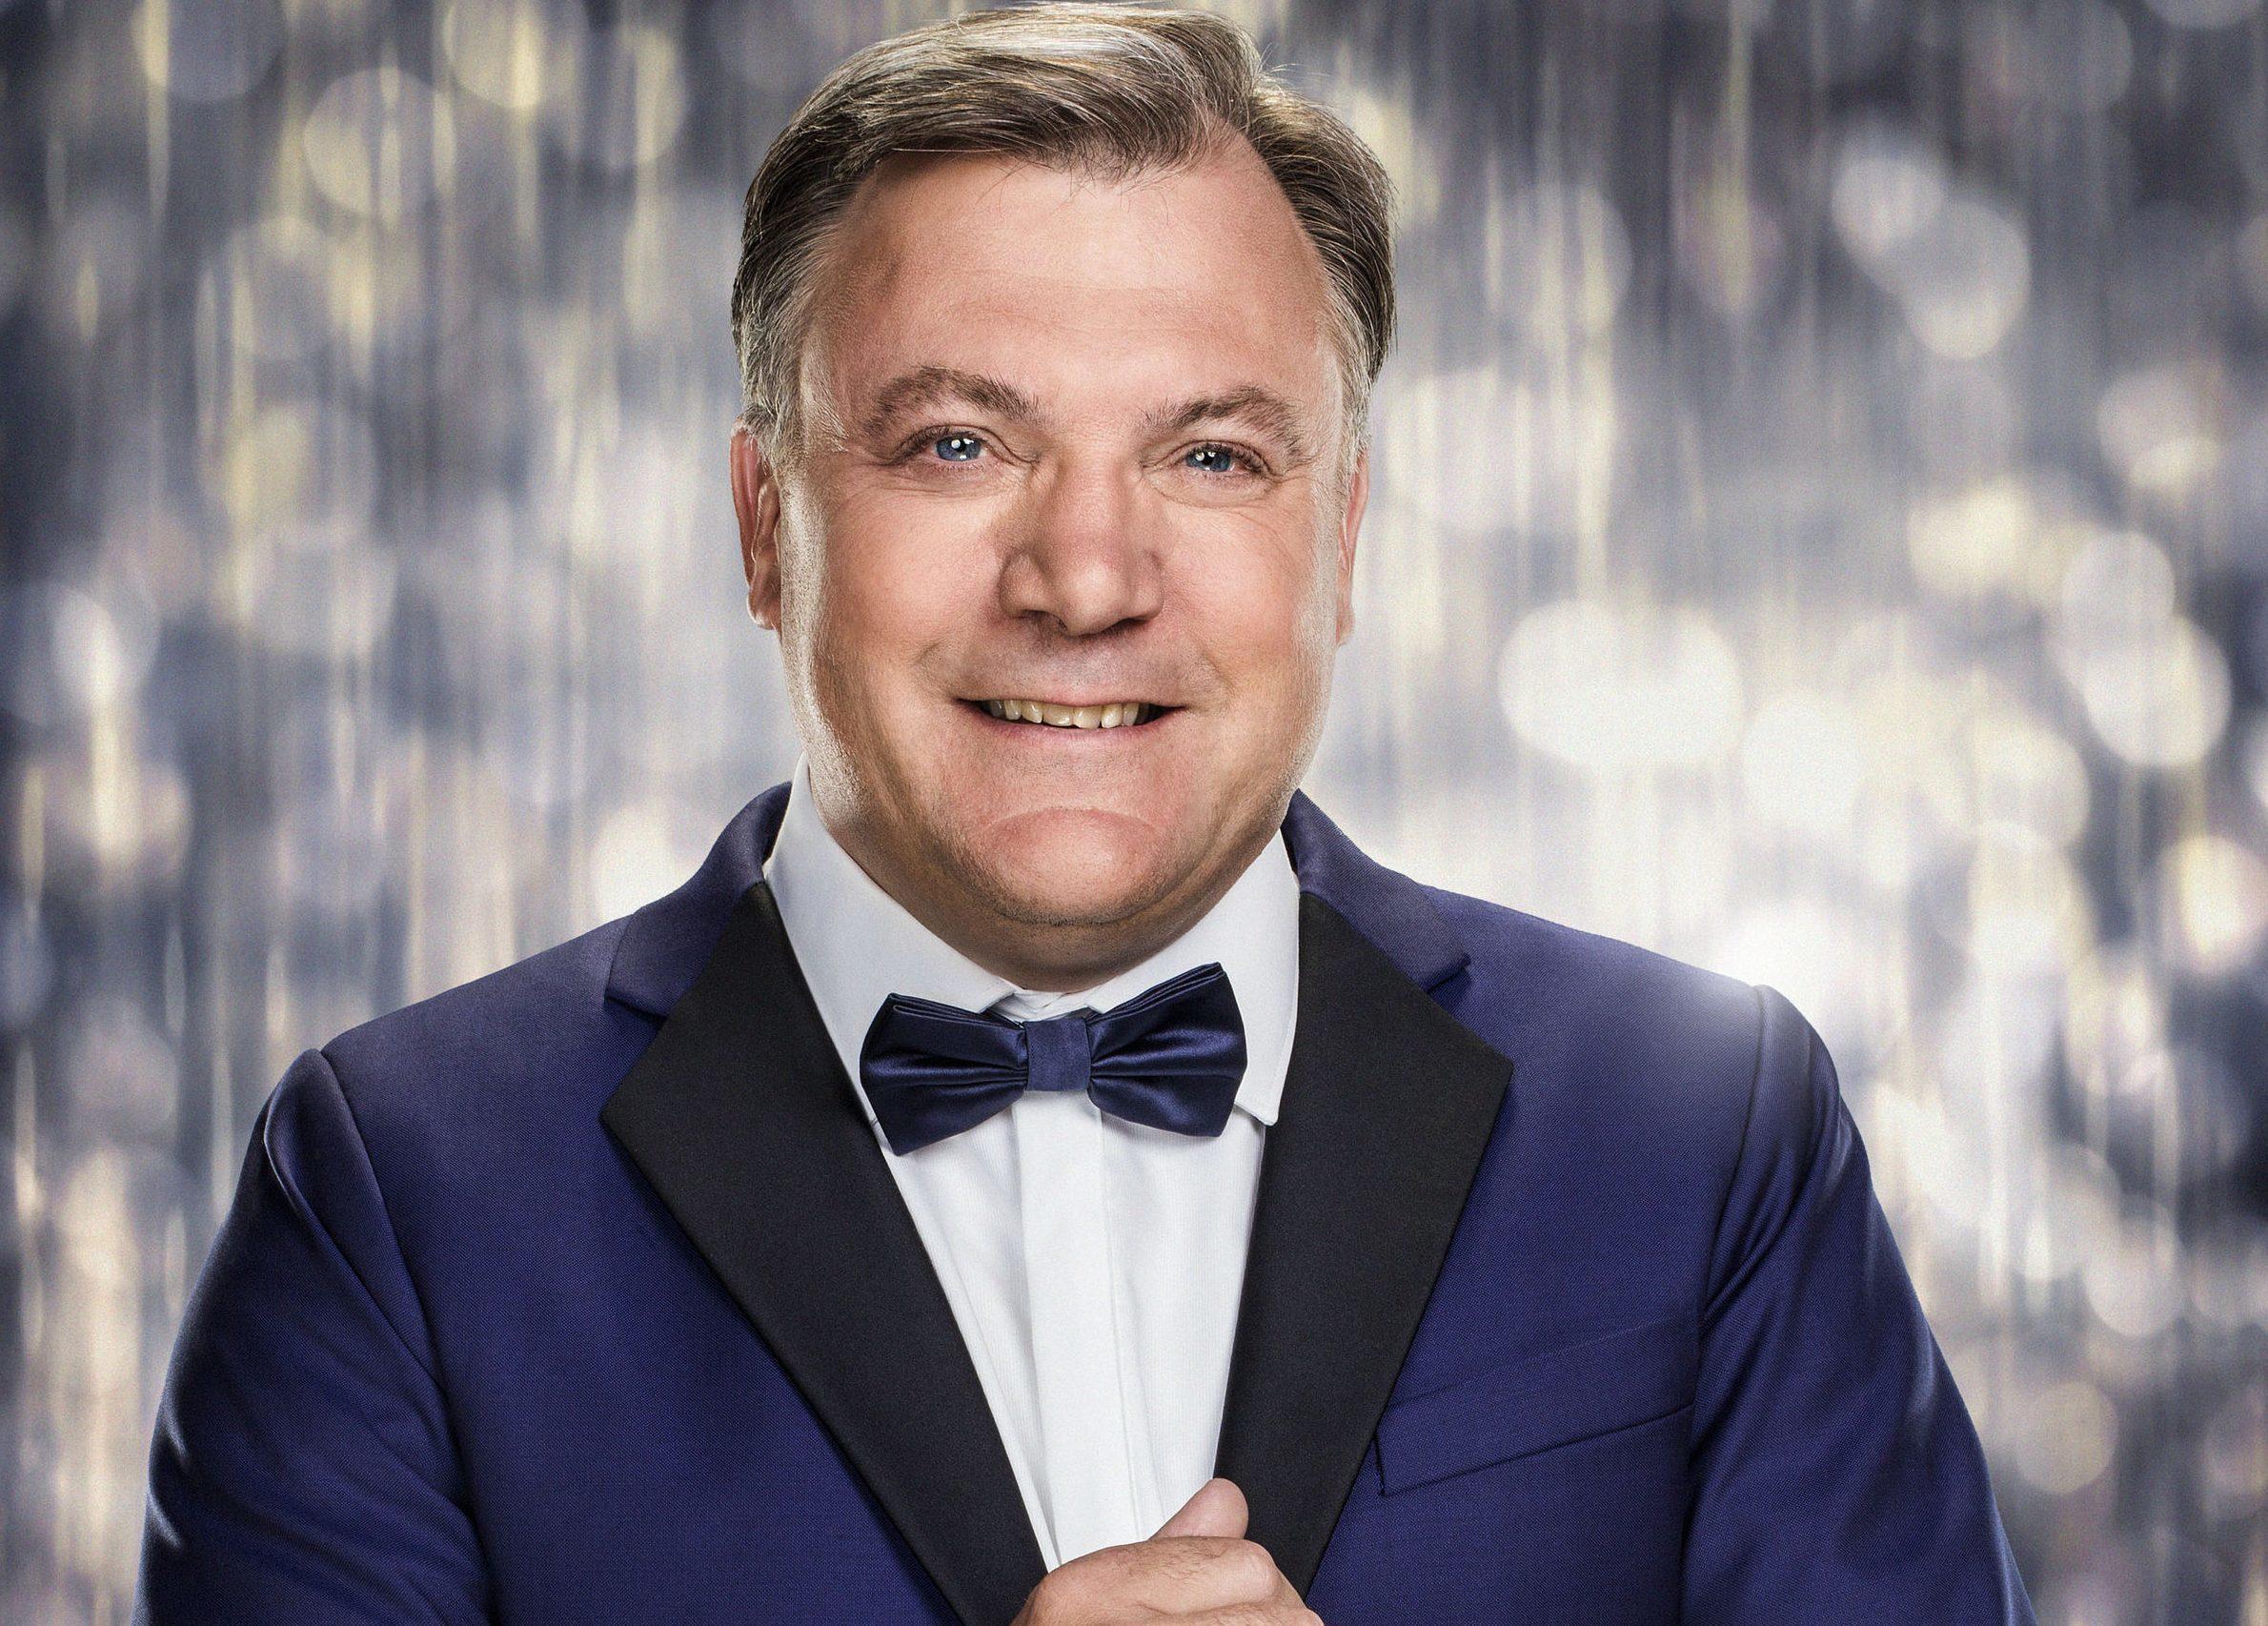 Former Shadow Chancellor-turned dance floor star Ed Balls